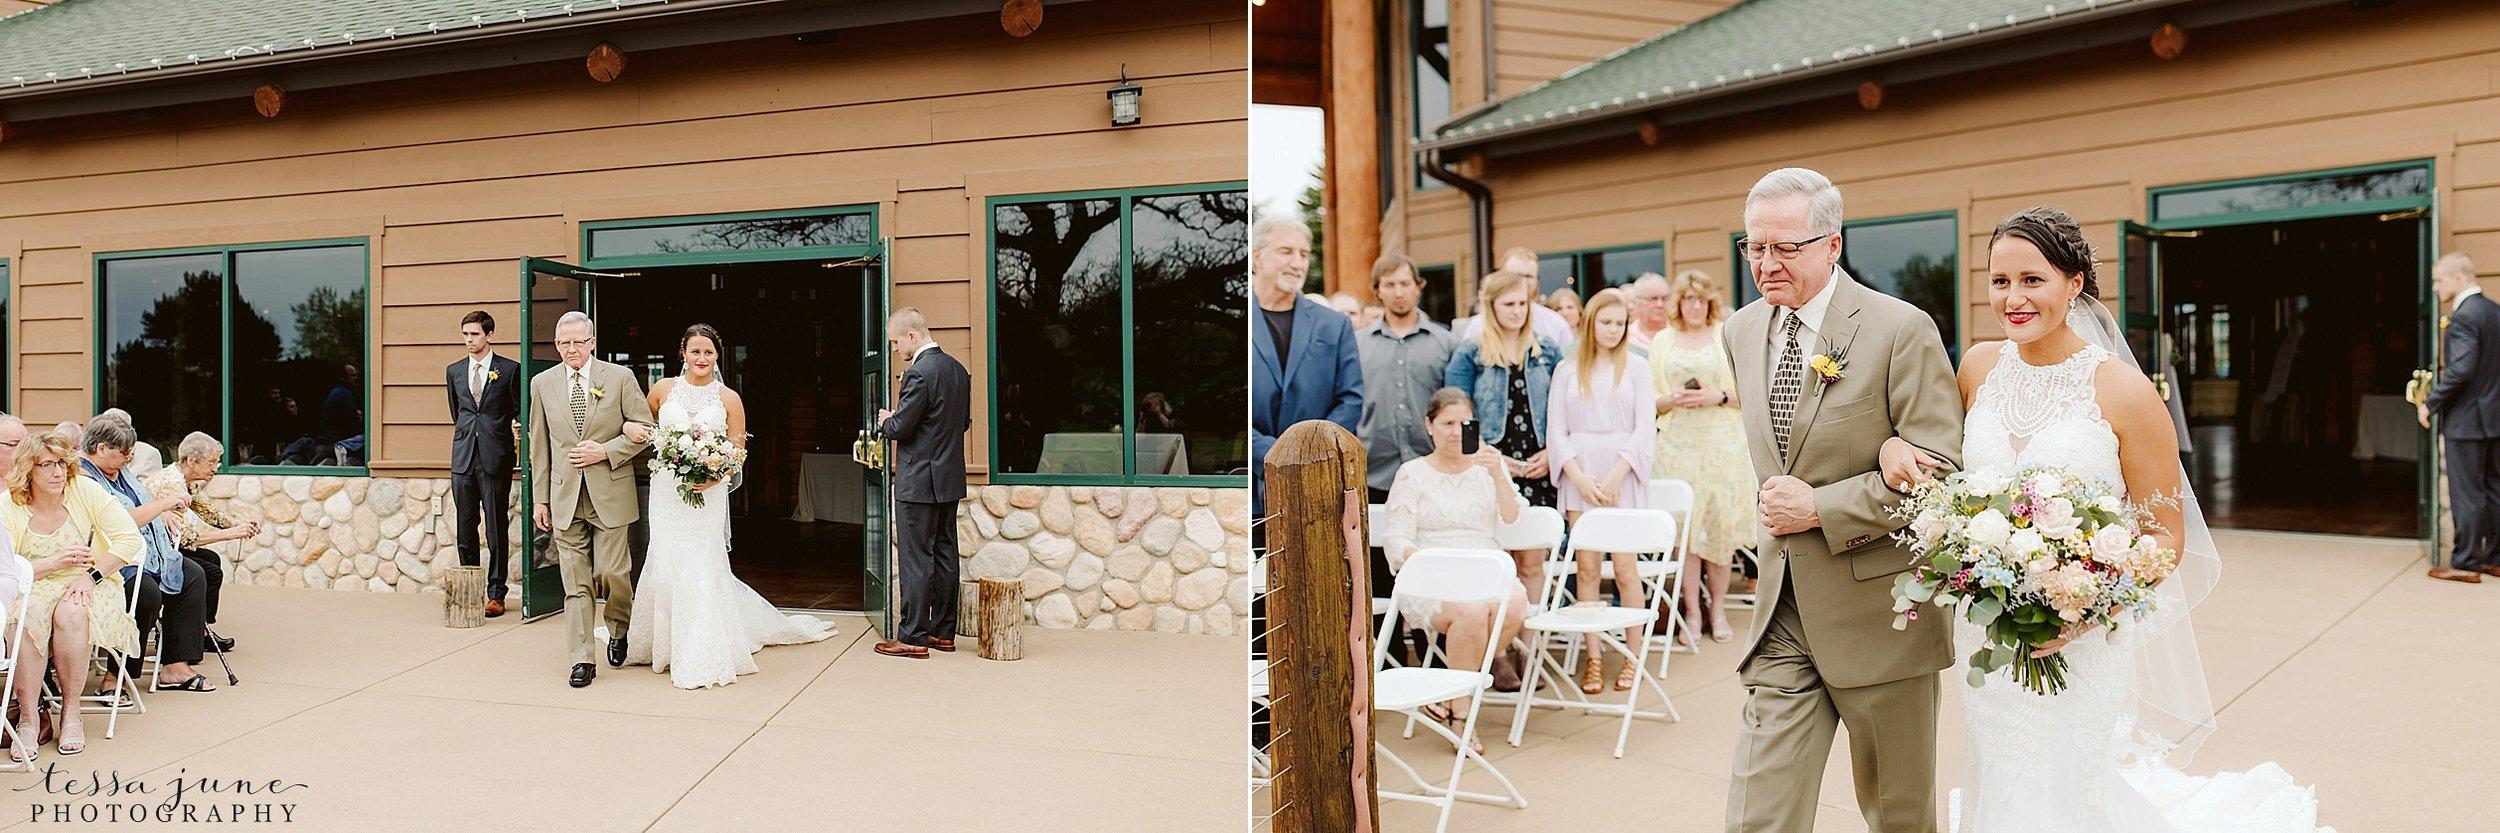 The-grands-at-mulligans-wedding-sartell-minnesota-spring-floral-spring-garden-wedding-86.jpg